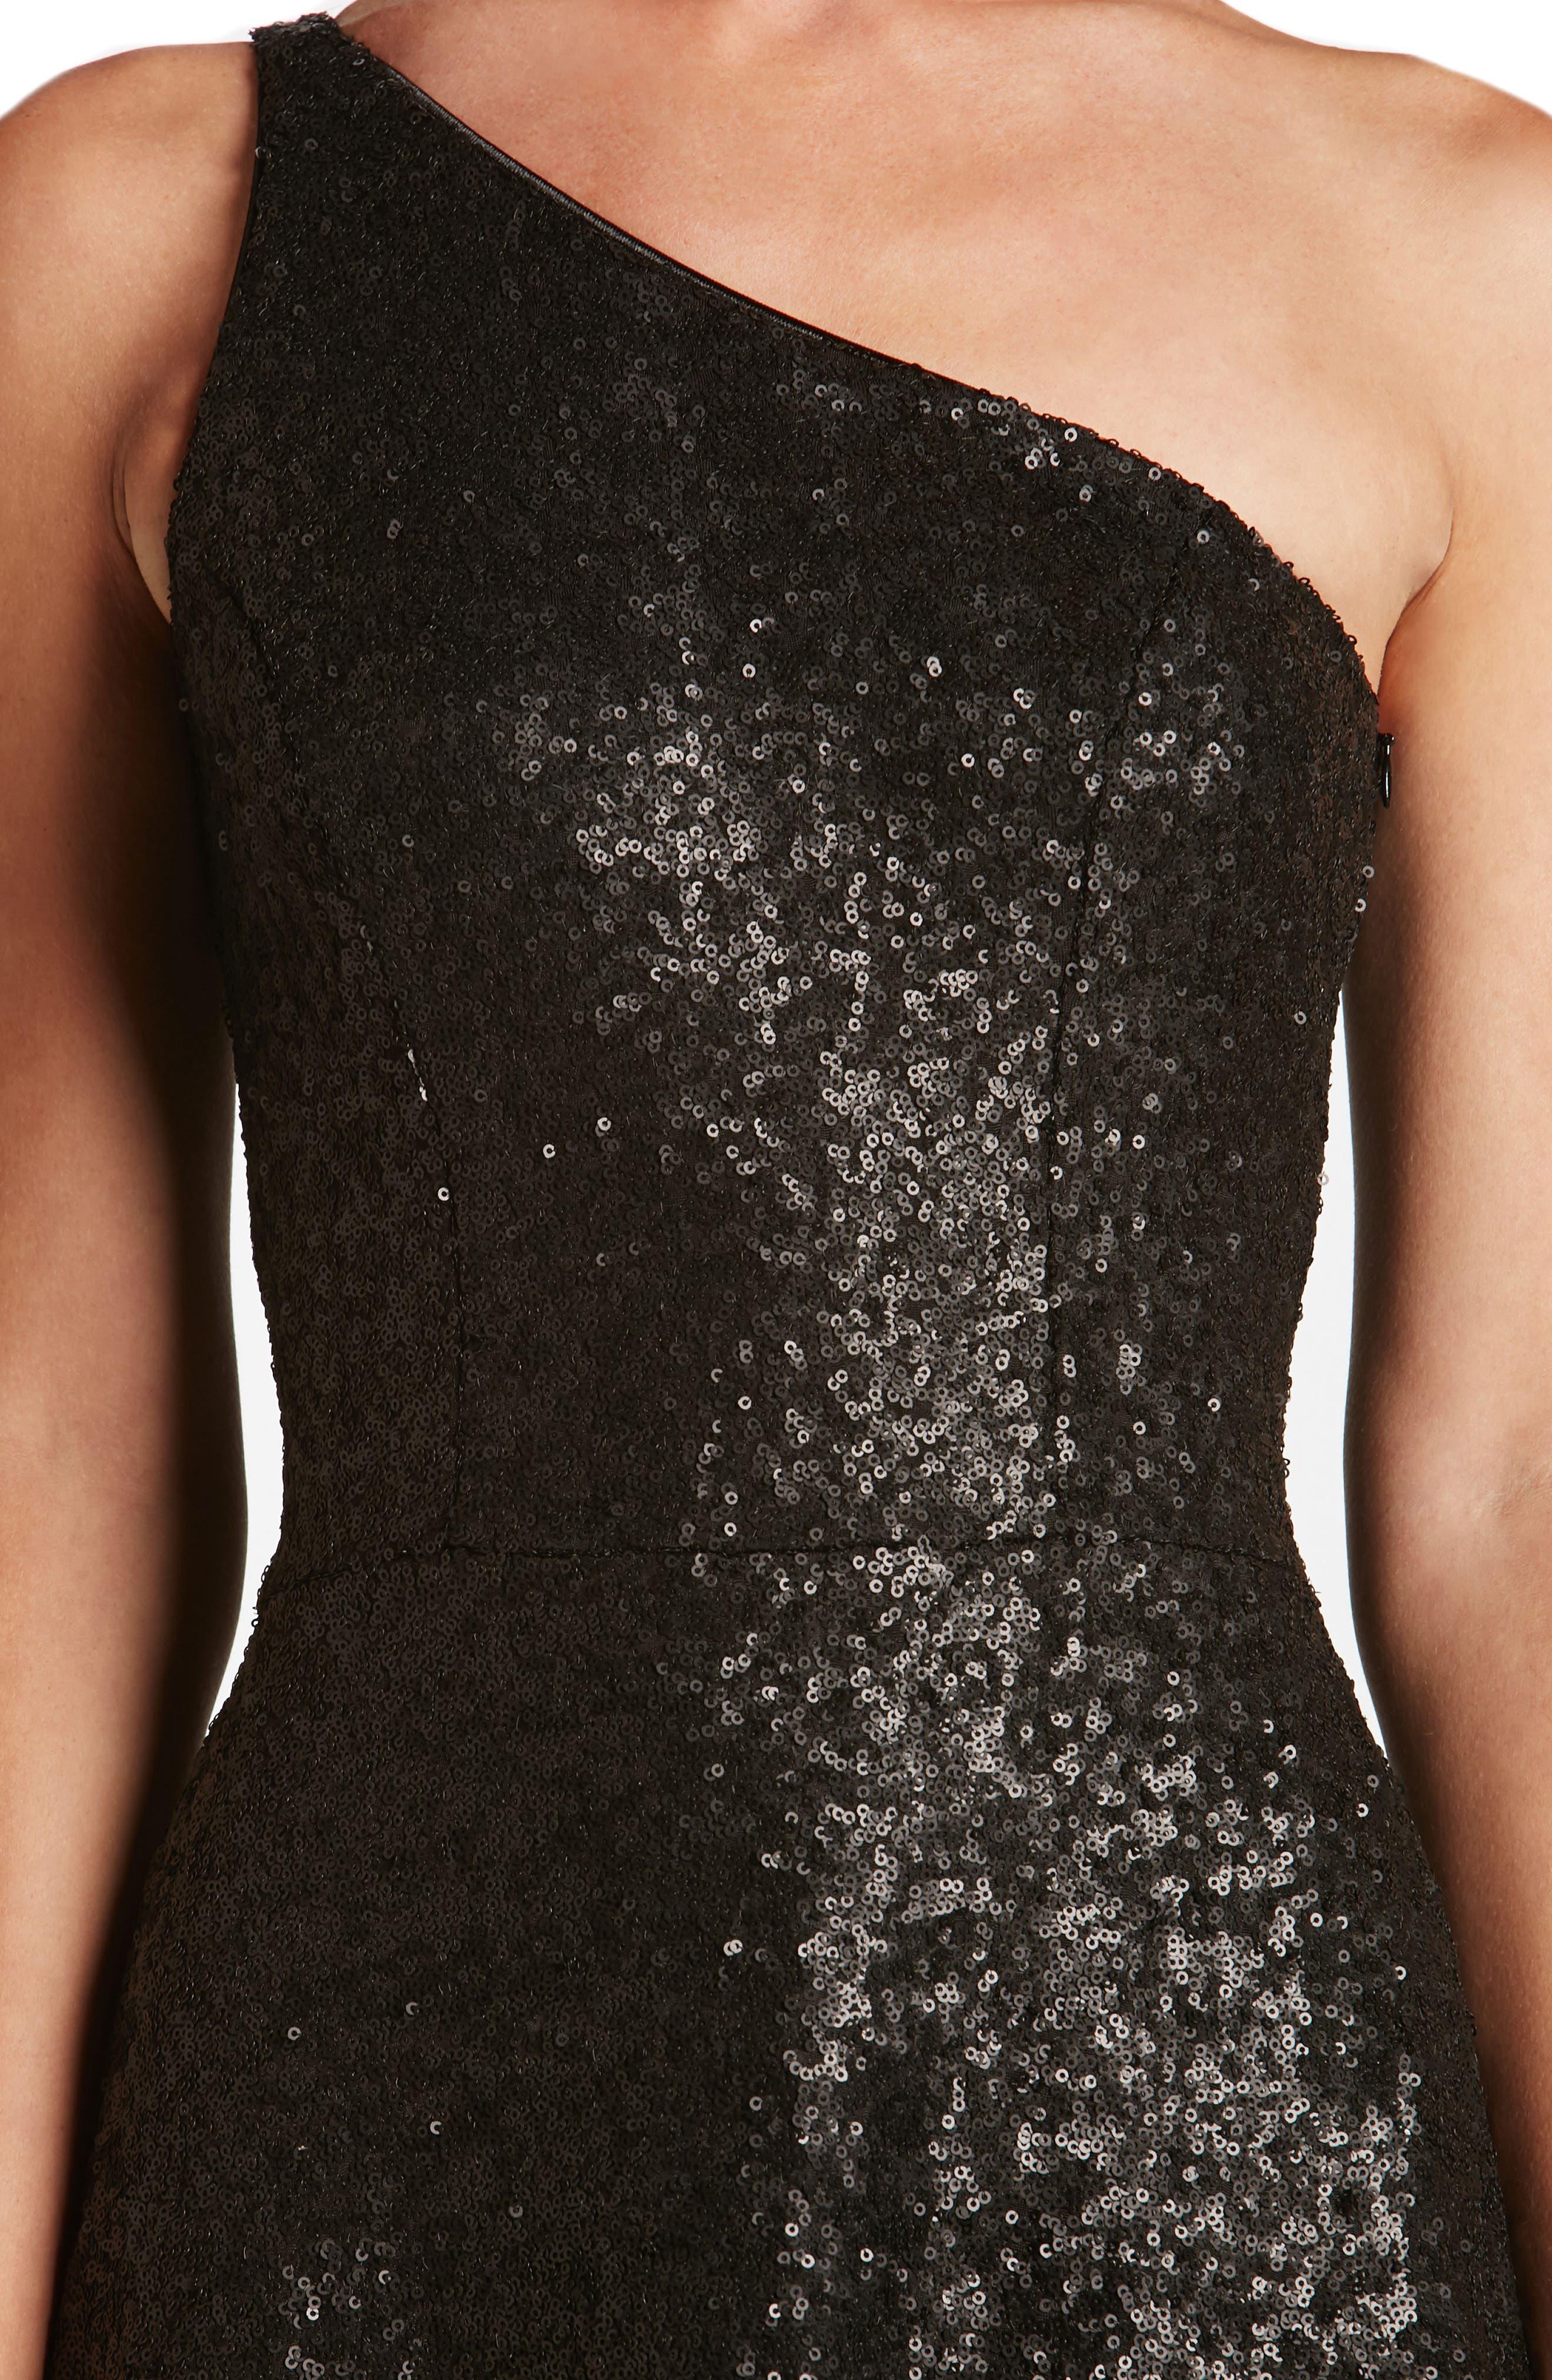 Tina One-Shoulder Sequin Fit & Flare Dress,                             Alternate thumbnail 4, color,                             018